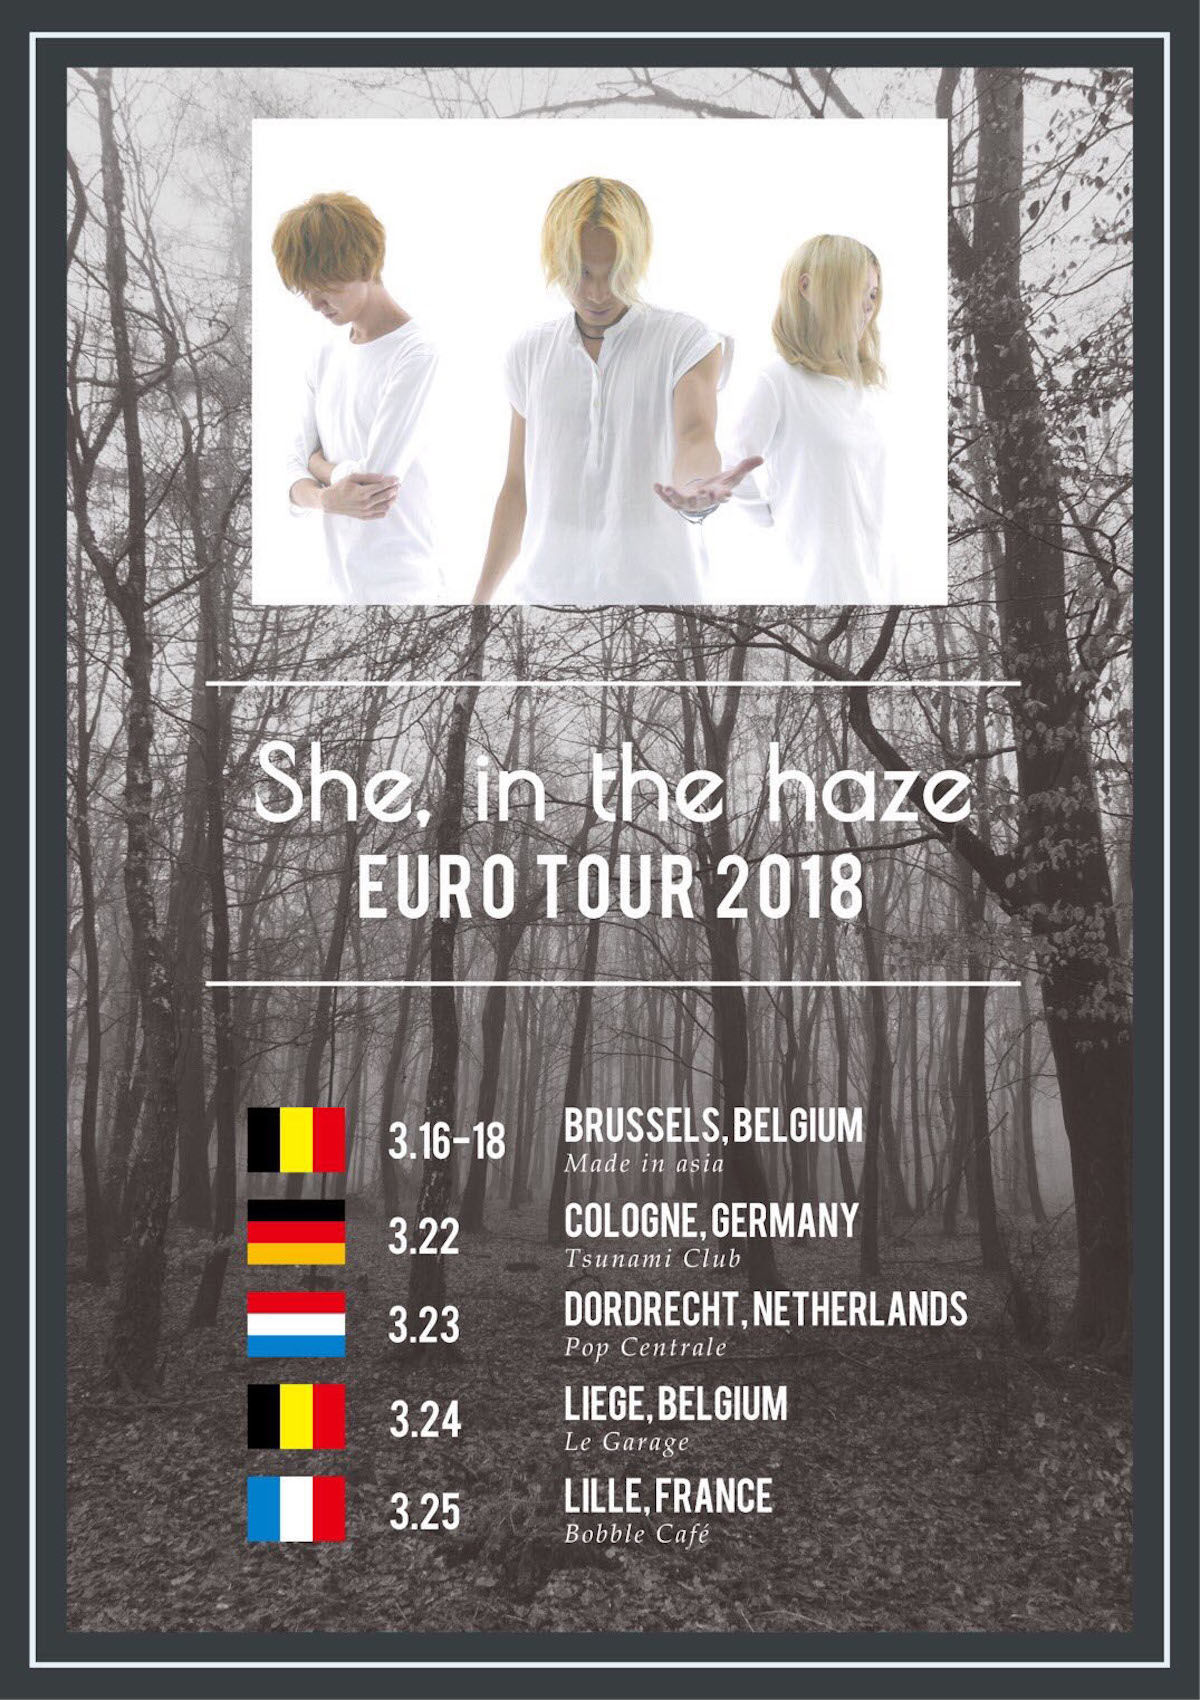 She, in the haze、ヨーロッパツアー決定!白き狂気を身にまとったクリエイター集団 music180214_sheinthehaze_3-1200x1700